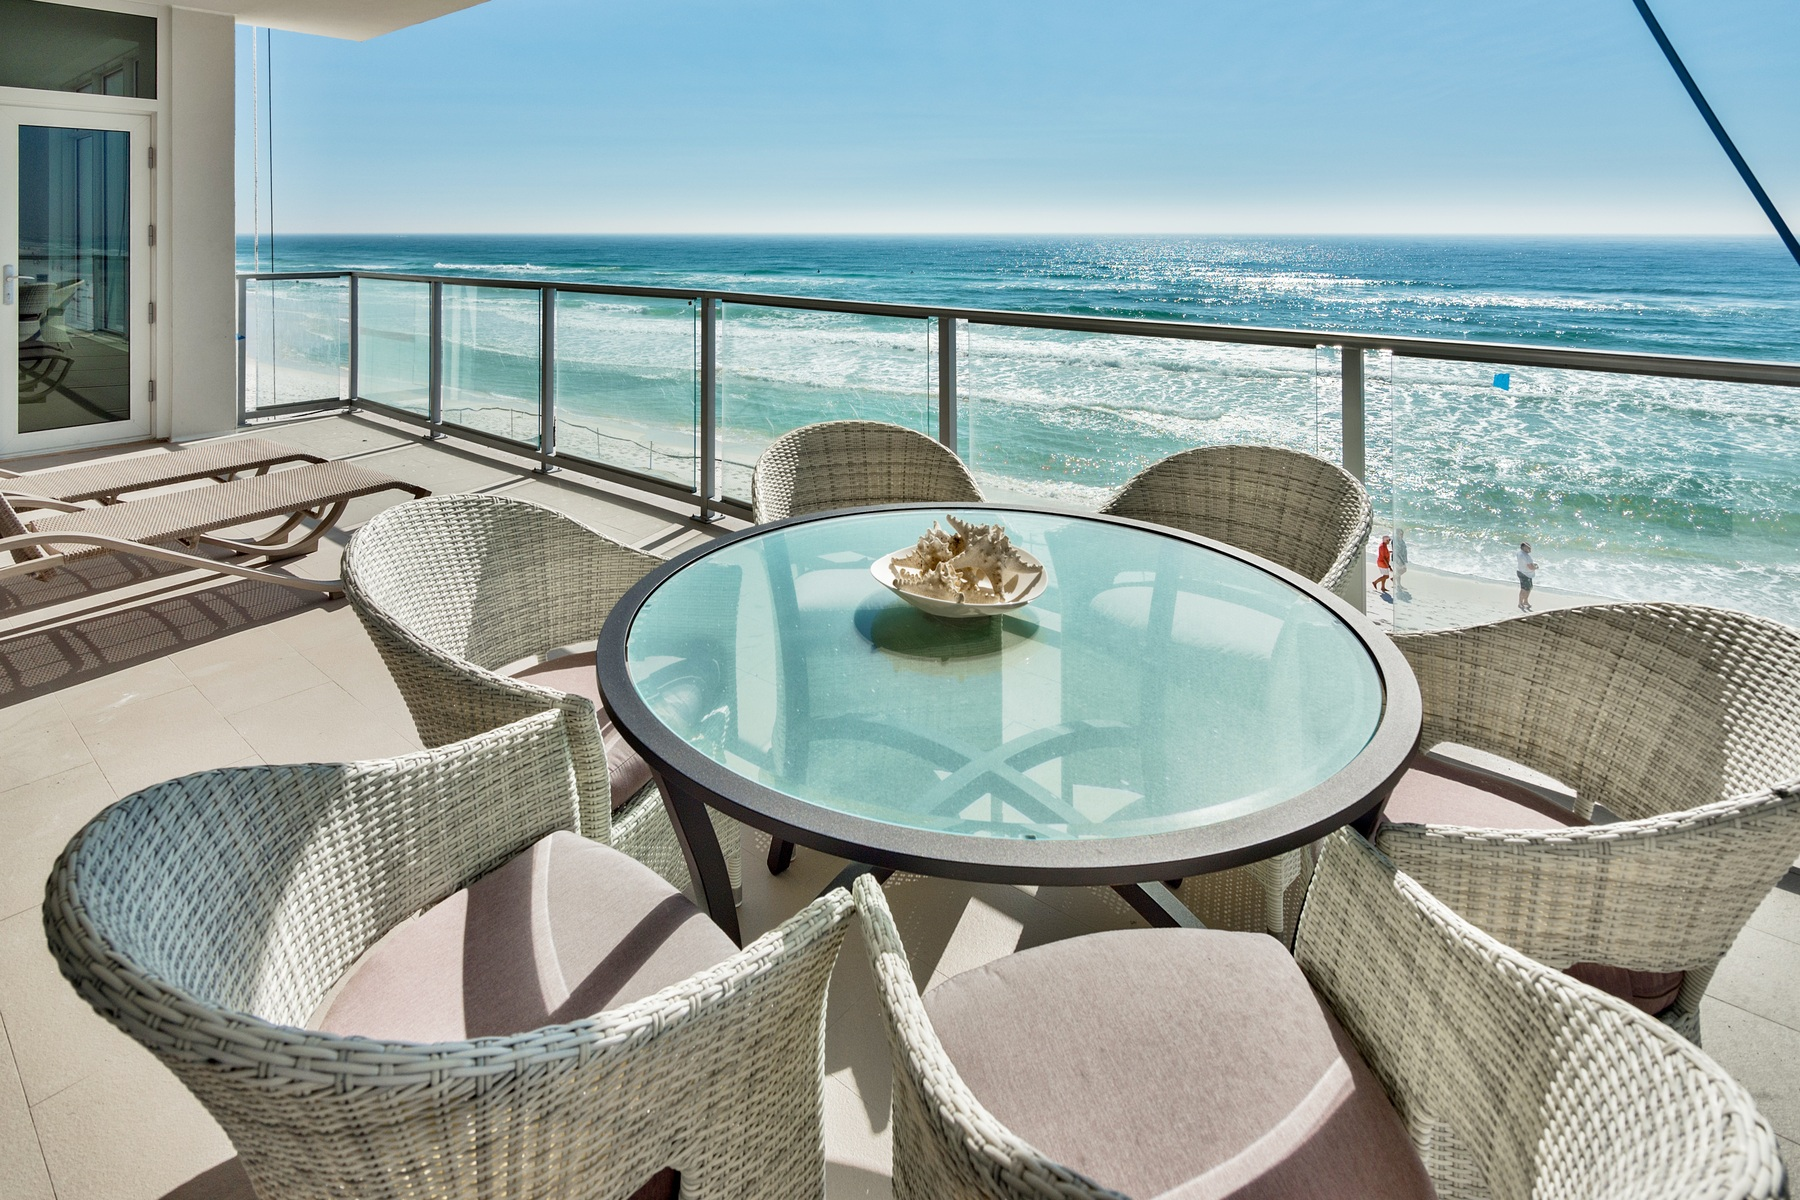 Condominium for Sale at LUXURIOUS PRE-CONSTRUCTION OPPORTUNITY Destin, Florida, 32541 United States